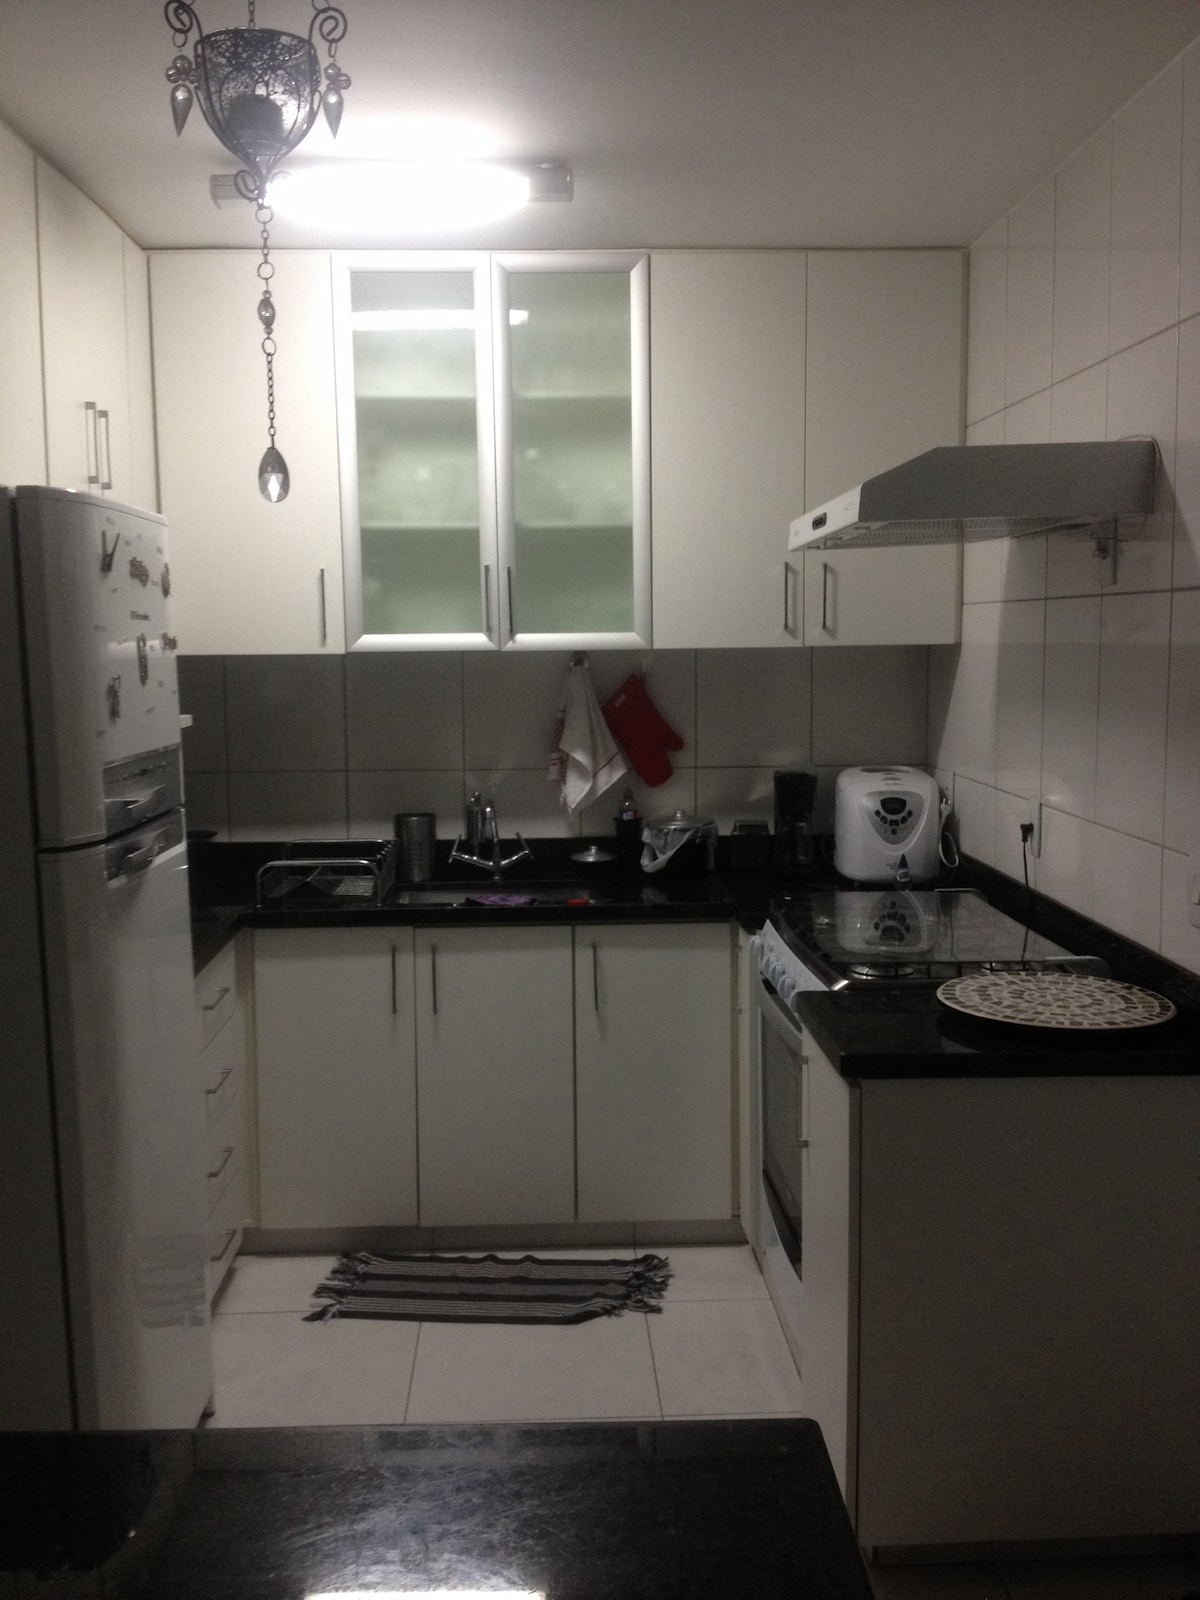 Excellent apartment - 3 bedroom!!!